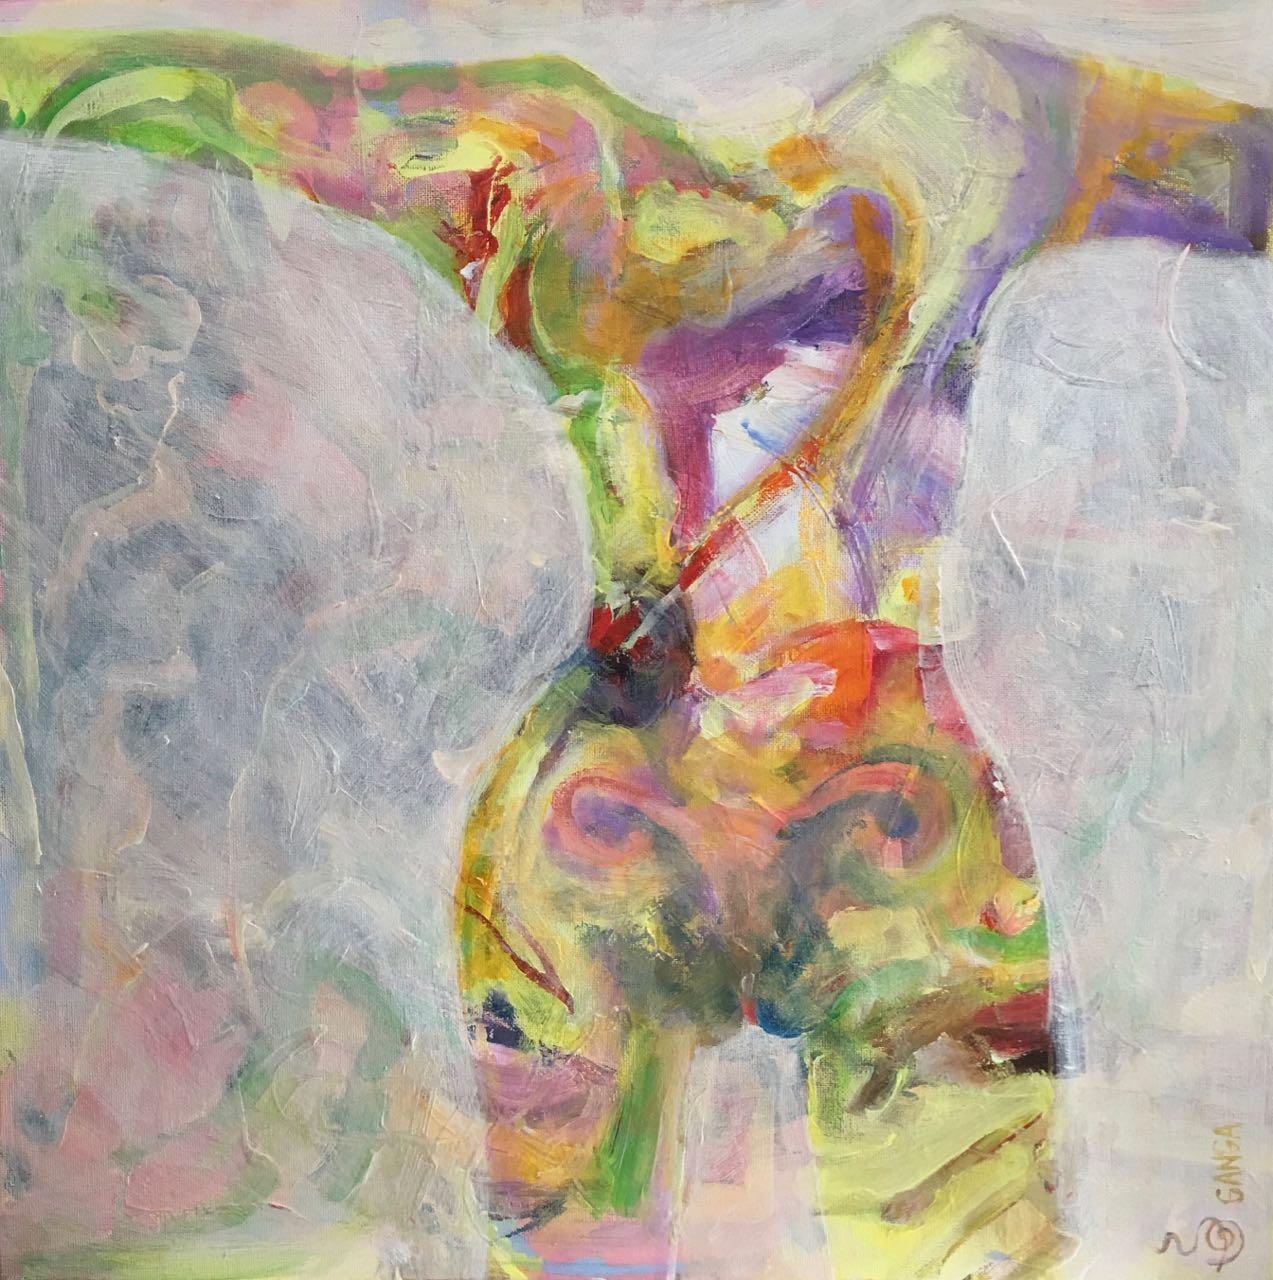 INWARD TORSO/HOPE. 50x50cm acrylic on canvas